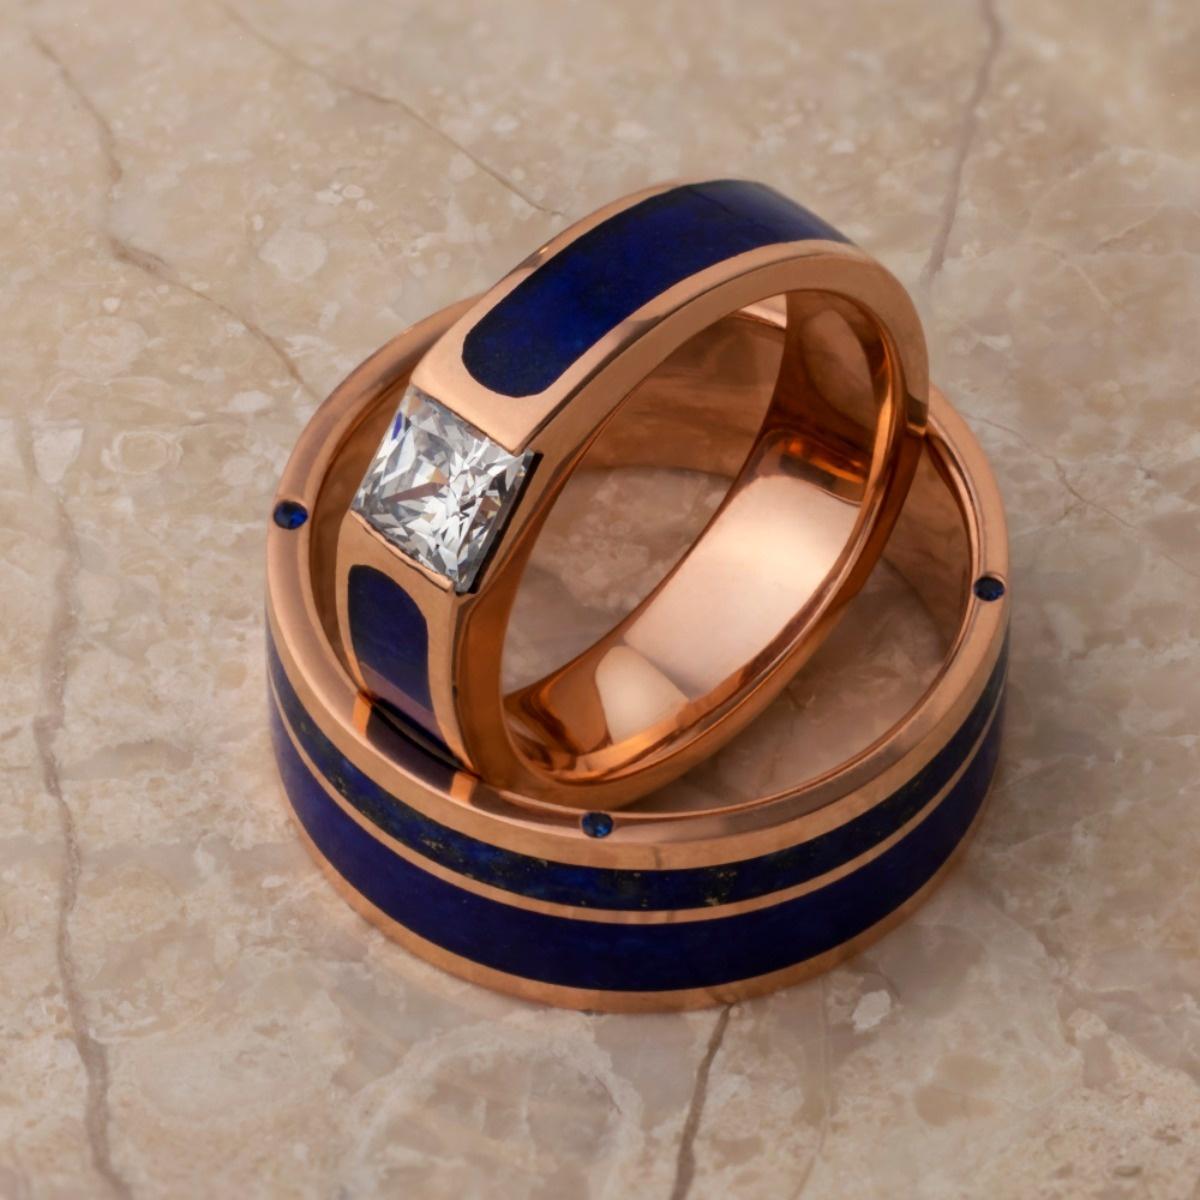 Jewelry by Johan - Best Wedding Jewelry in Saint Paul